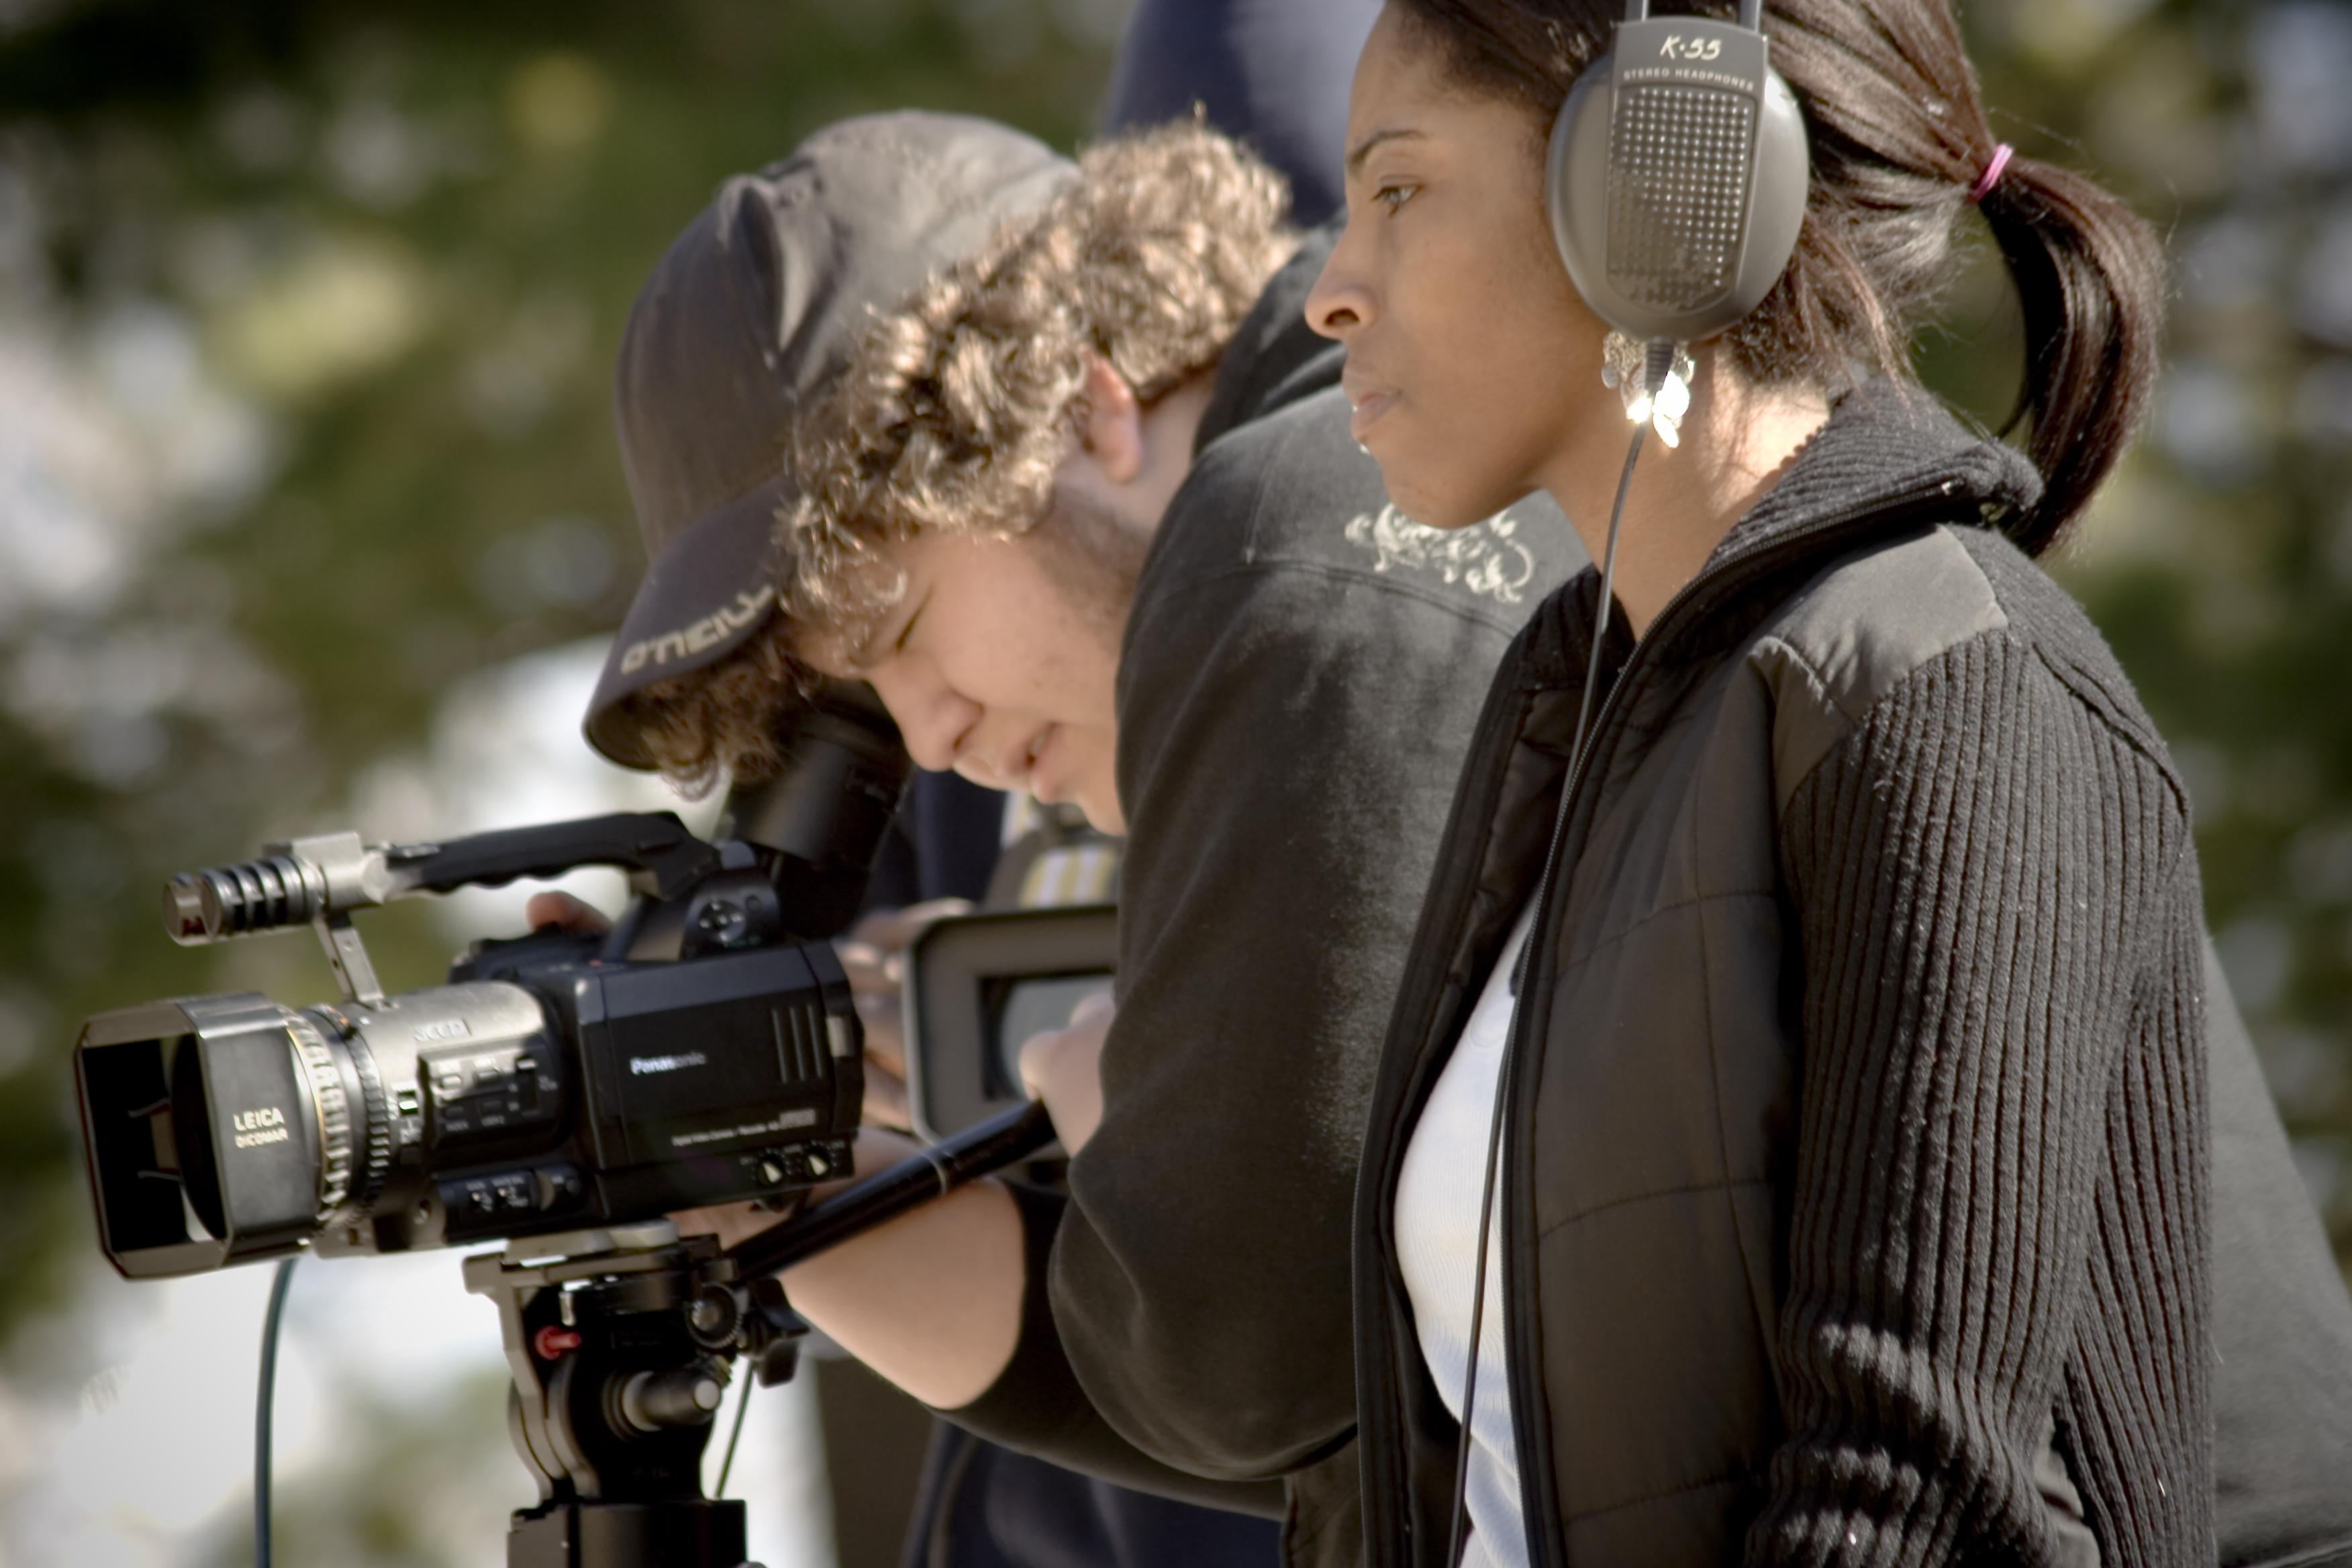 applinces funda: VideoGrapher